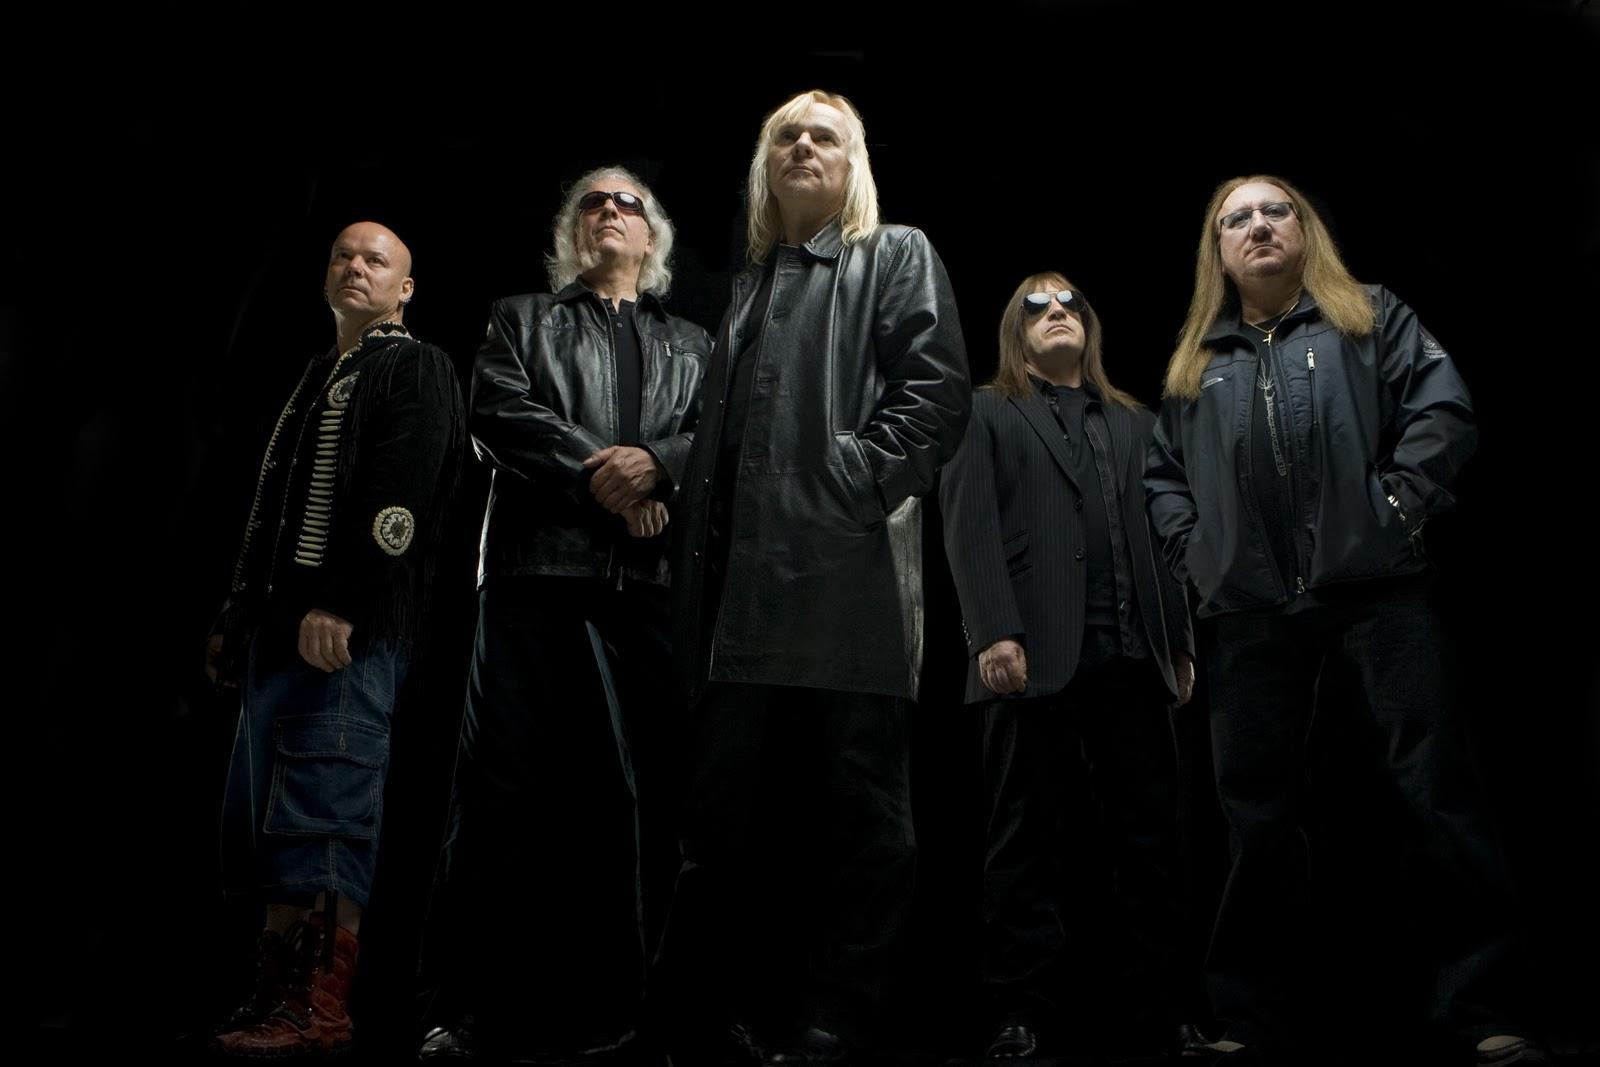 Bernie Shaw of Uriah Heep